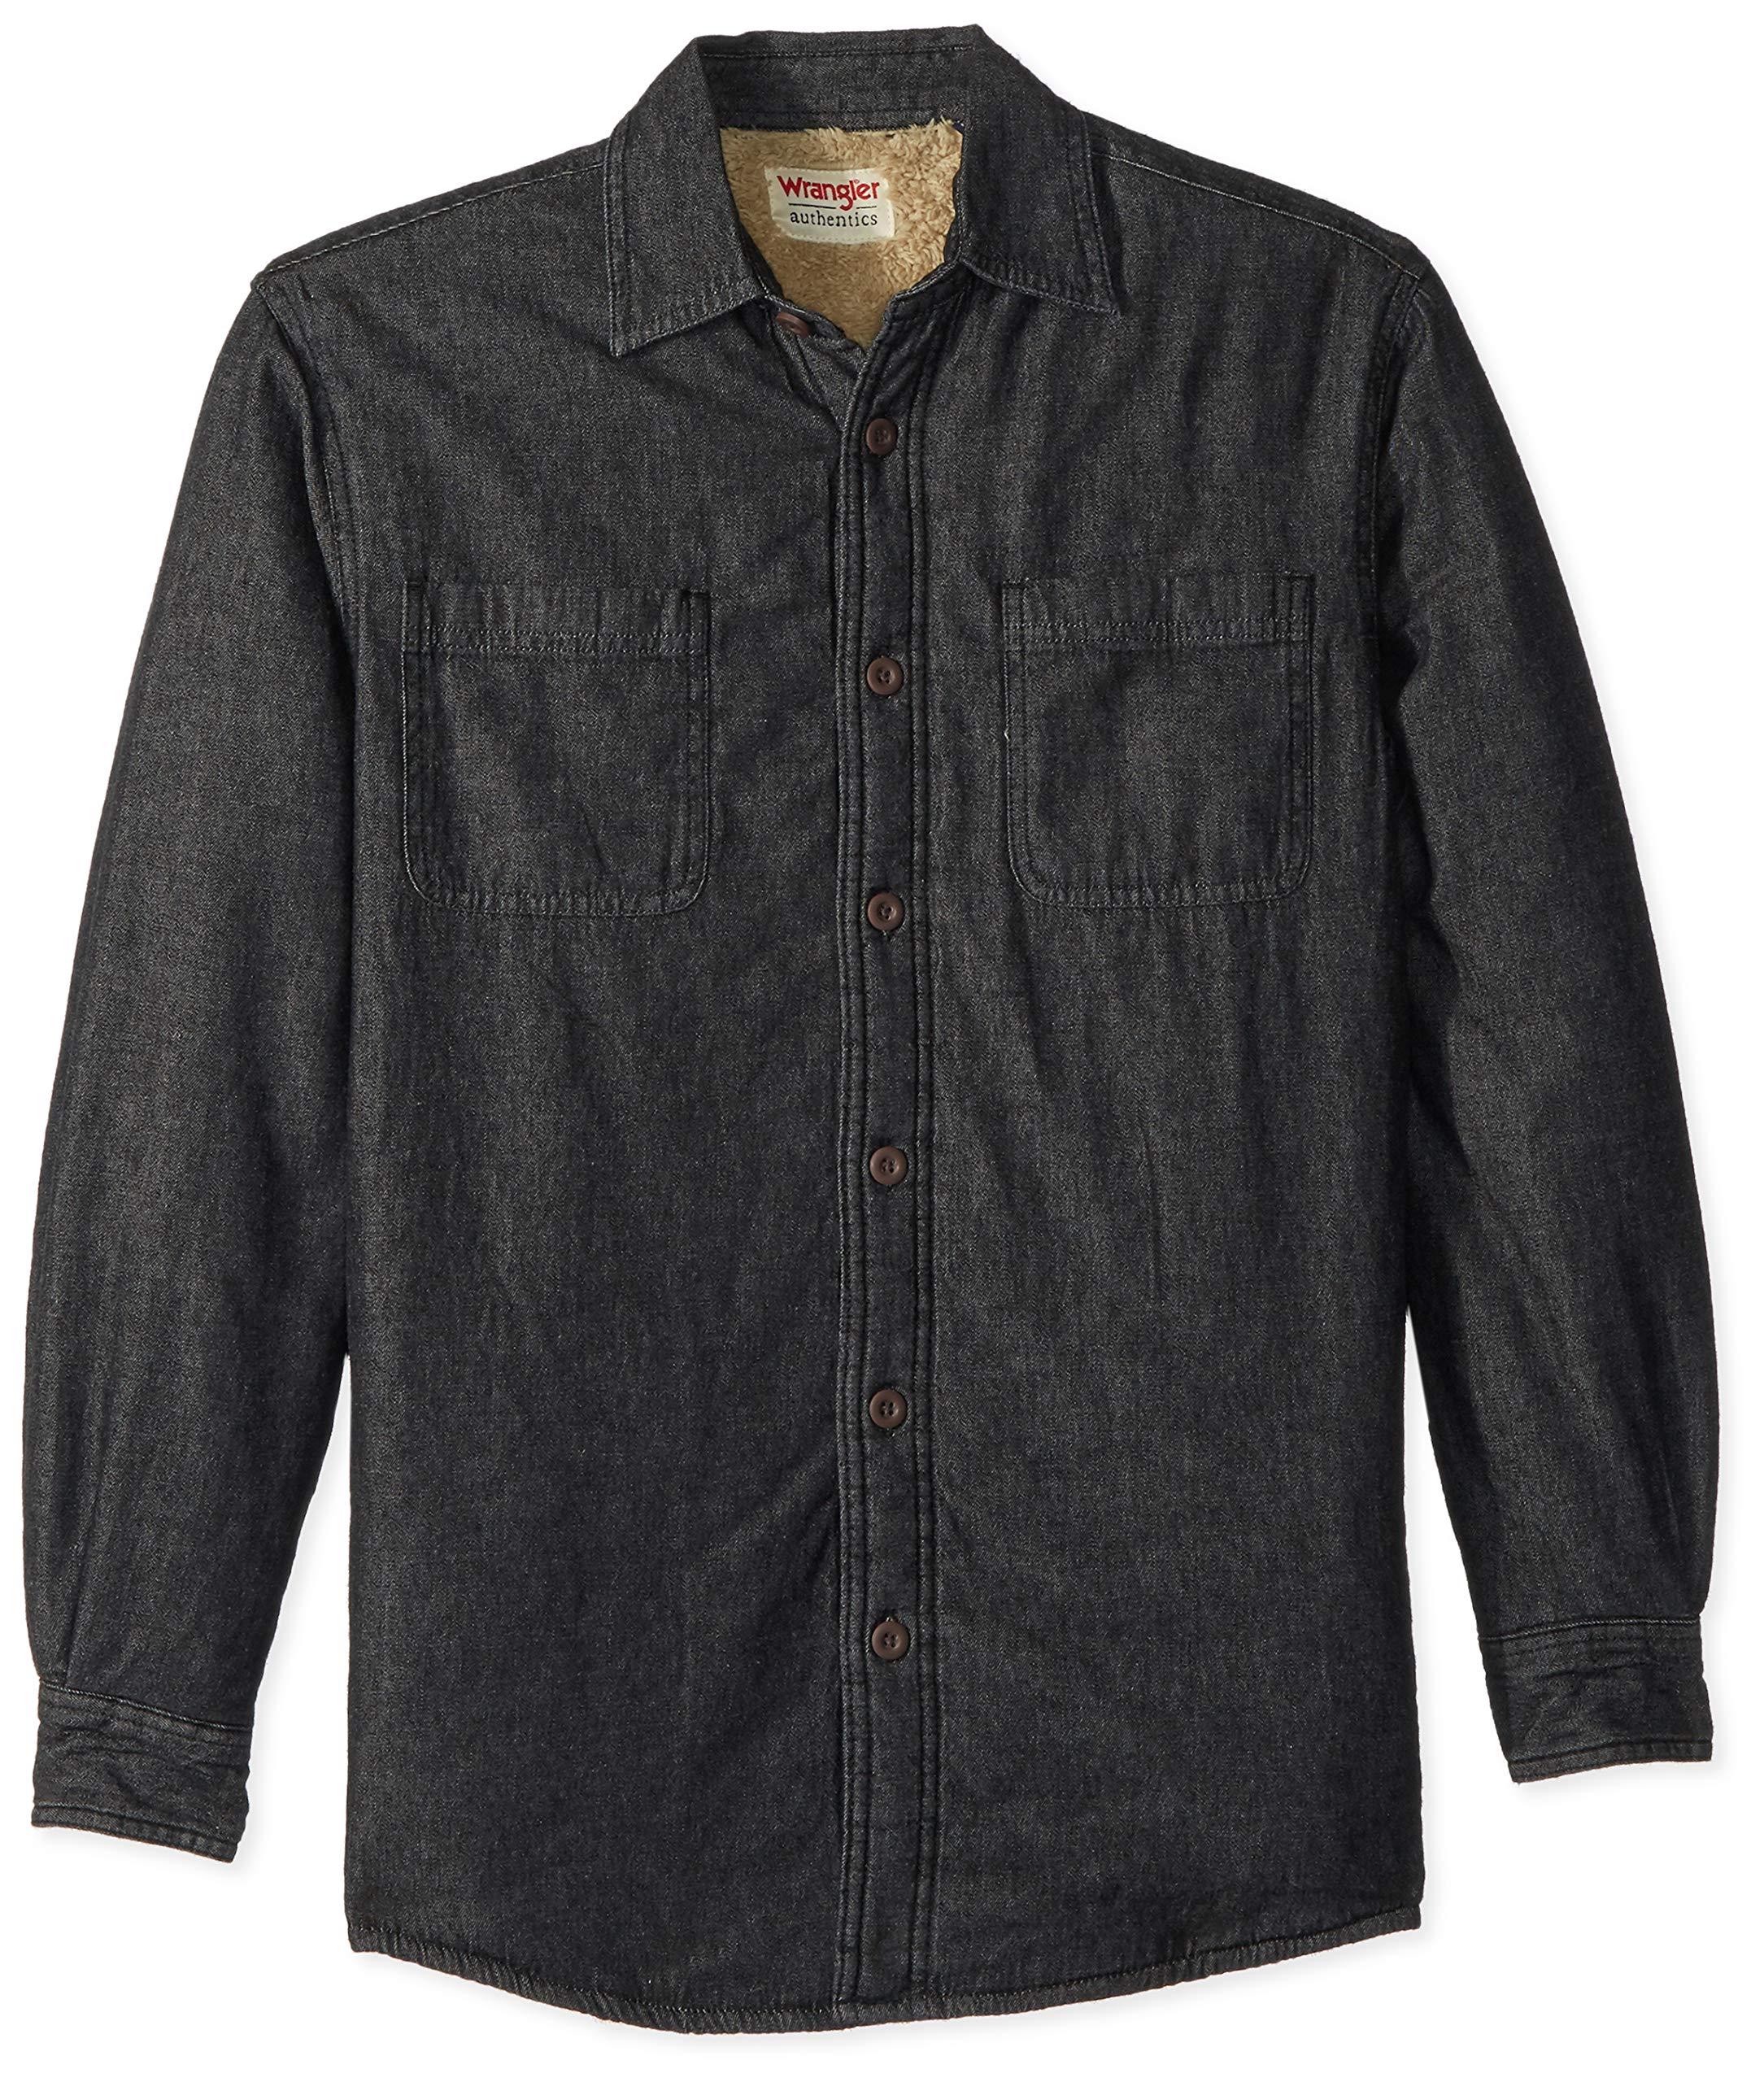 Wrangler Authentics Men's Long Sleeve Quilted Lined Flannel Shirt Jacket, Black Denim, X-Large